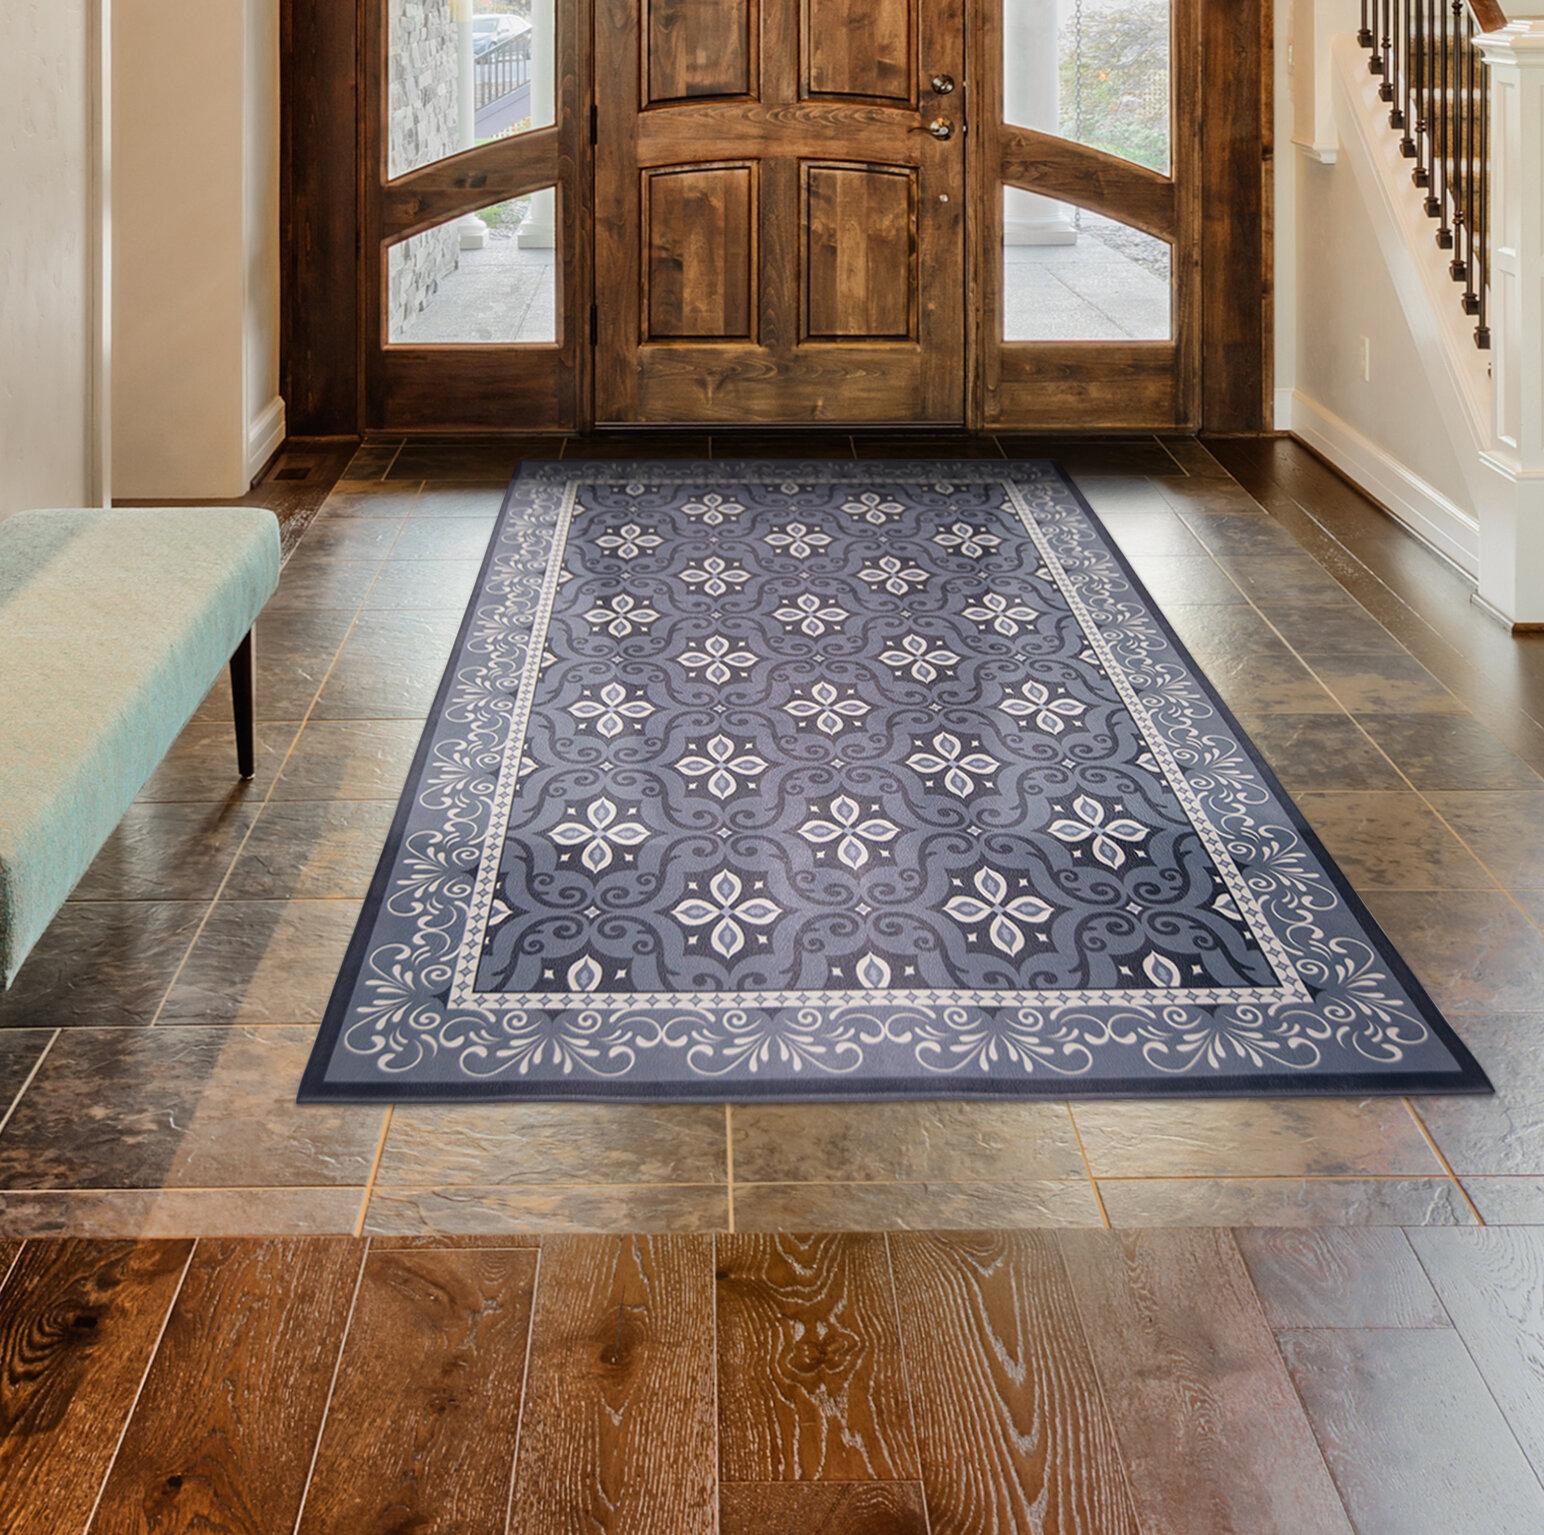 anti kitchen memory ideas mats including floor fatigue foam beautiful collection mat